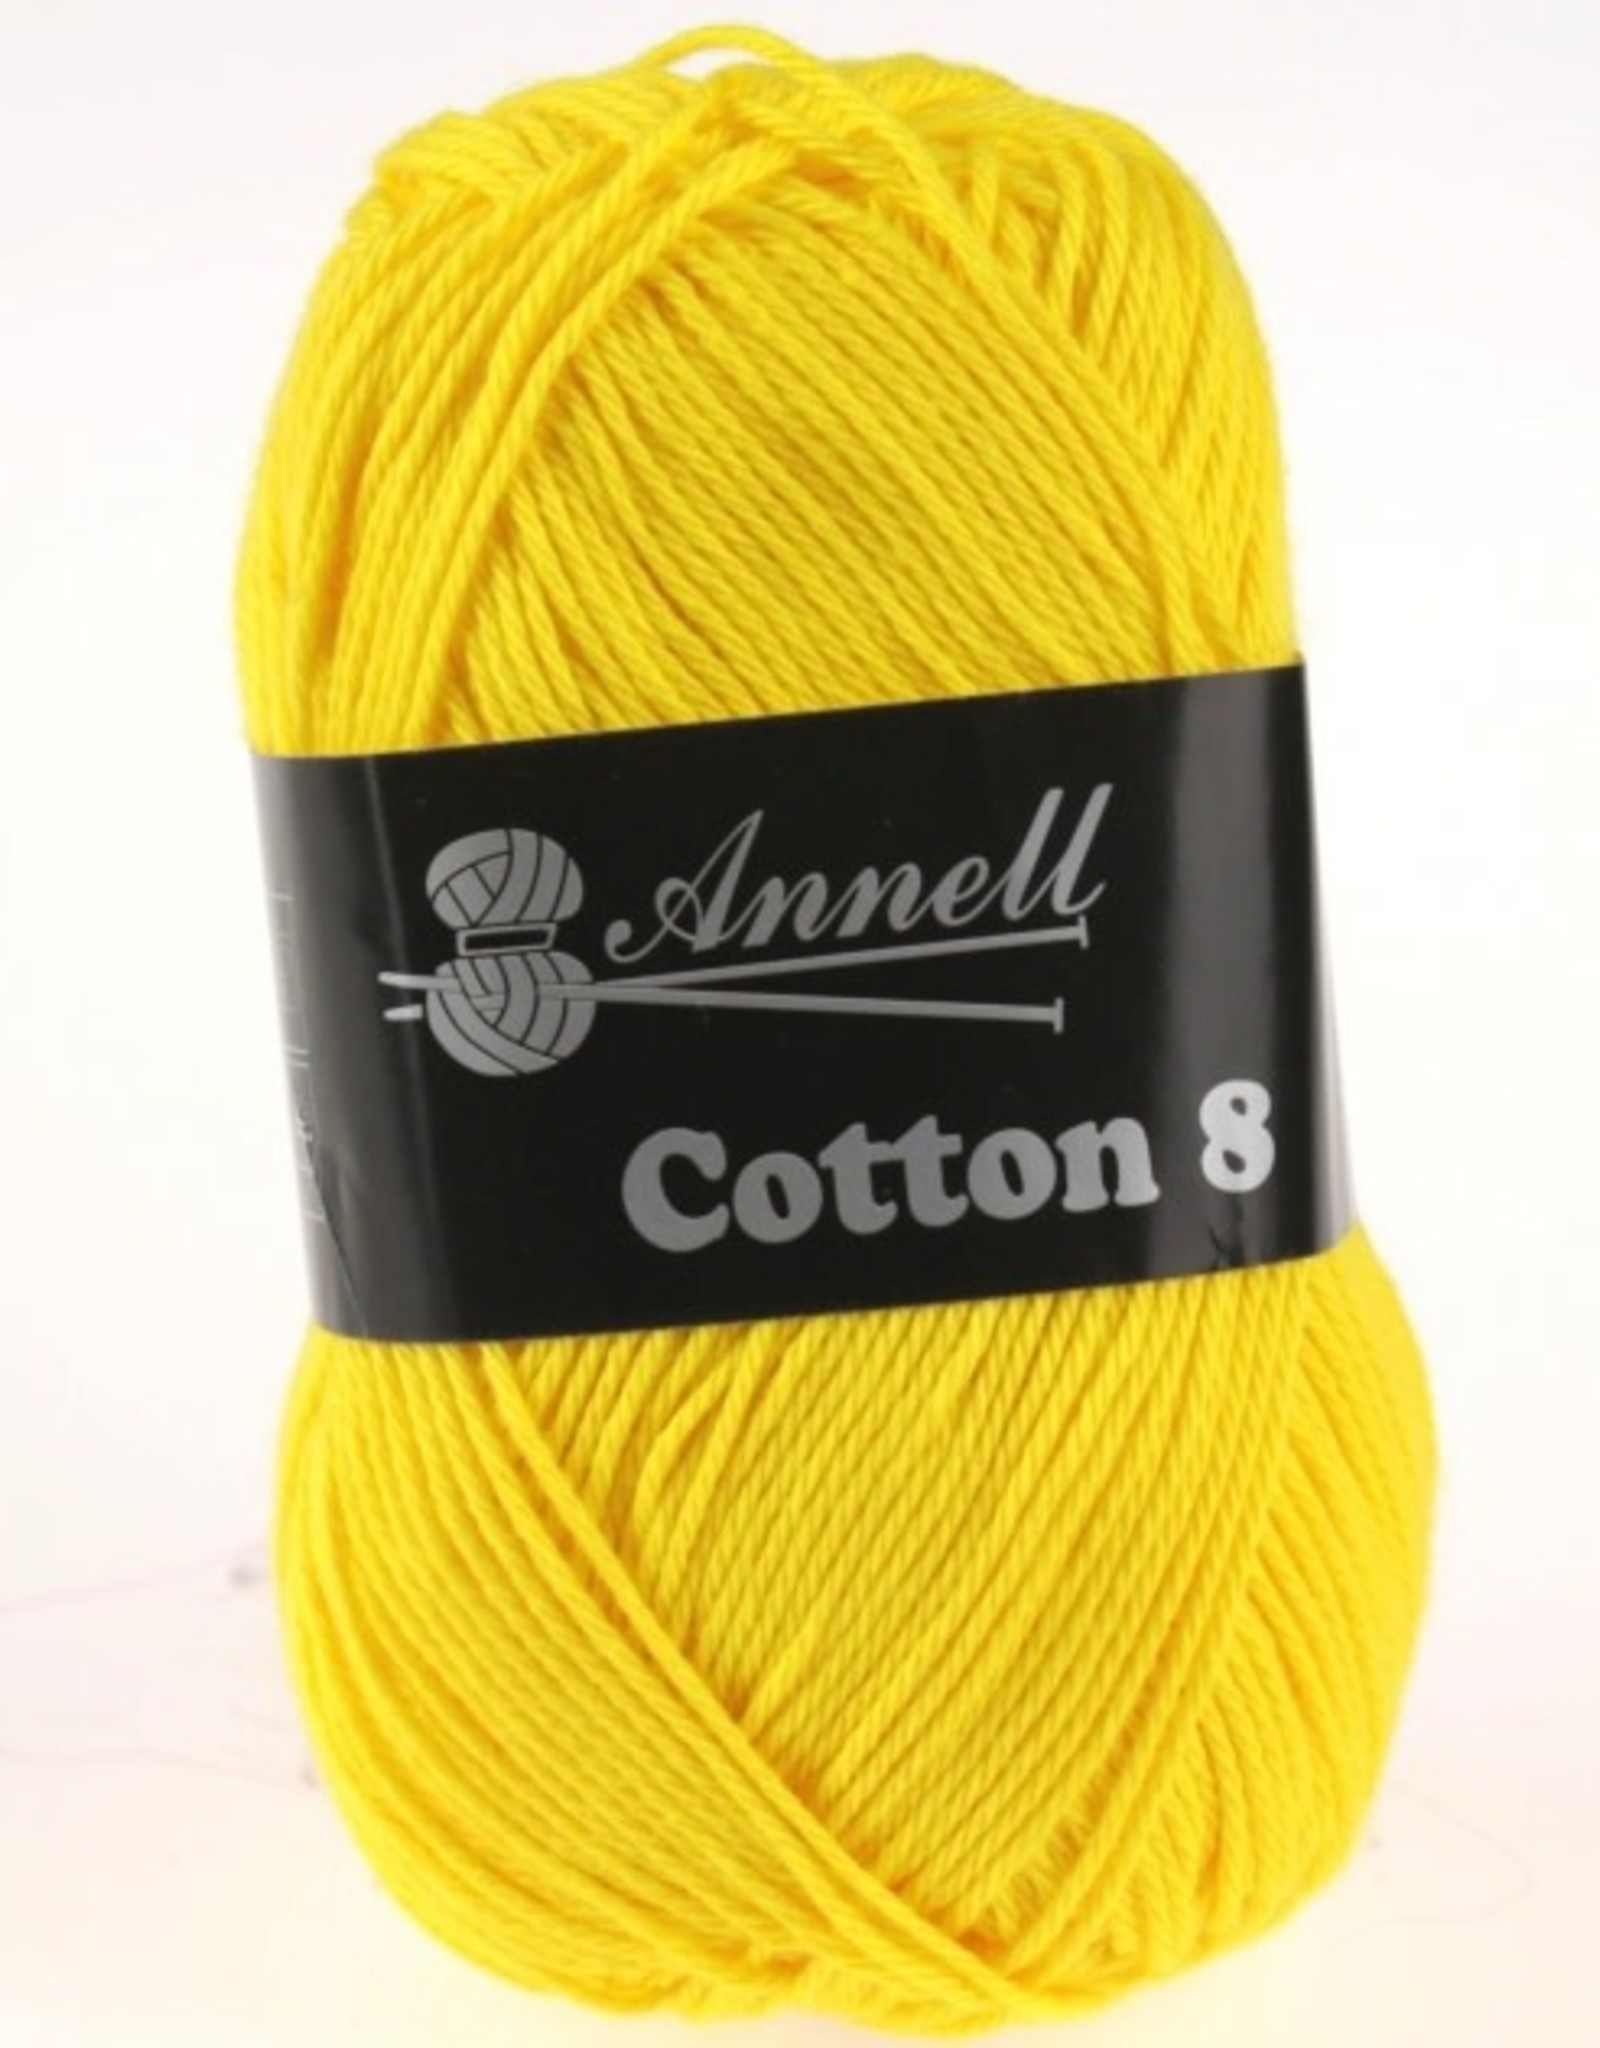 Annell Annell Cotton 8 15